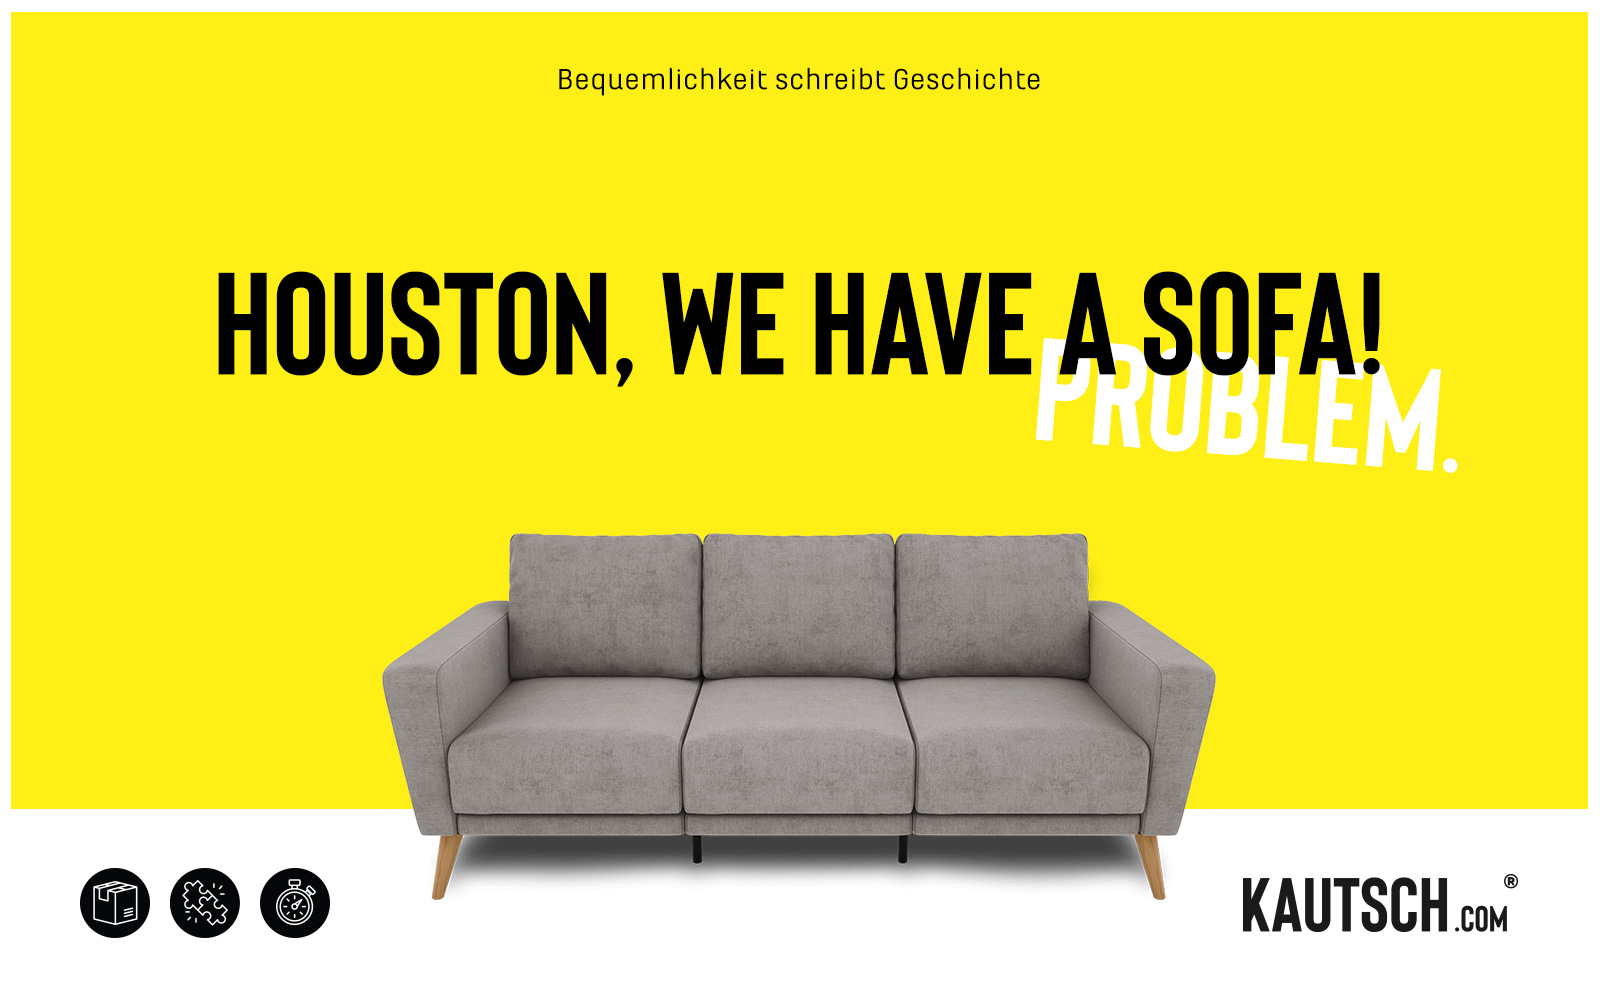 KAUTSCH.com – Kampagne WE HAVE A SOFA